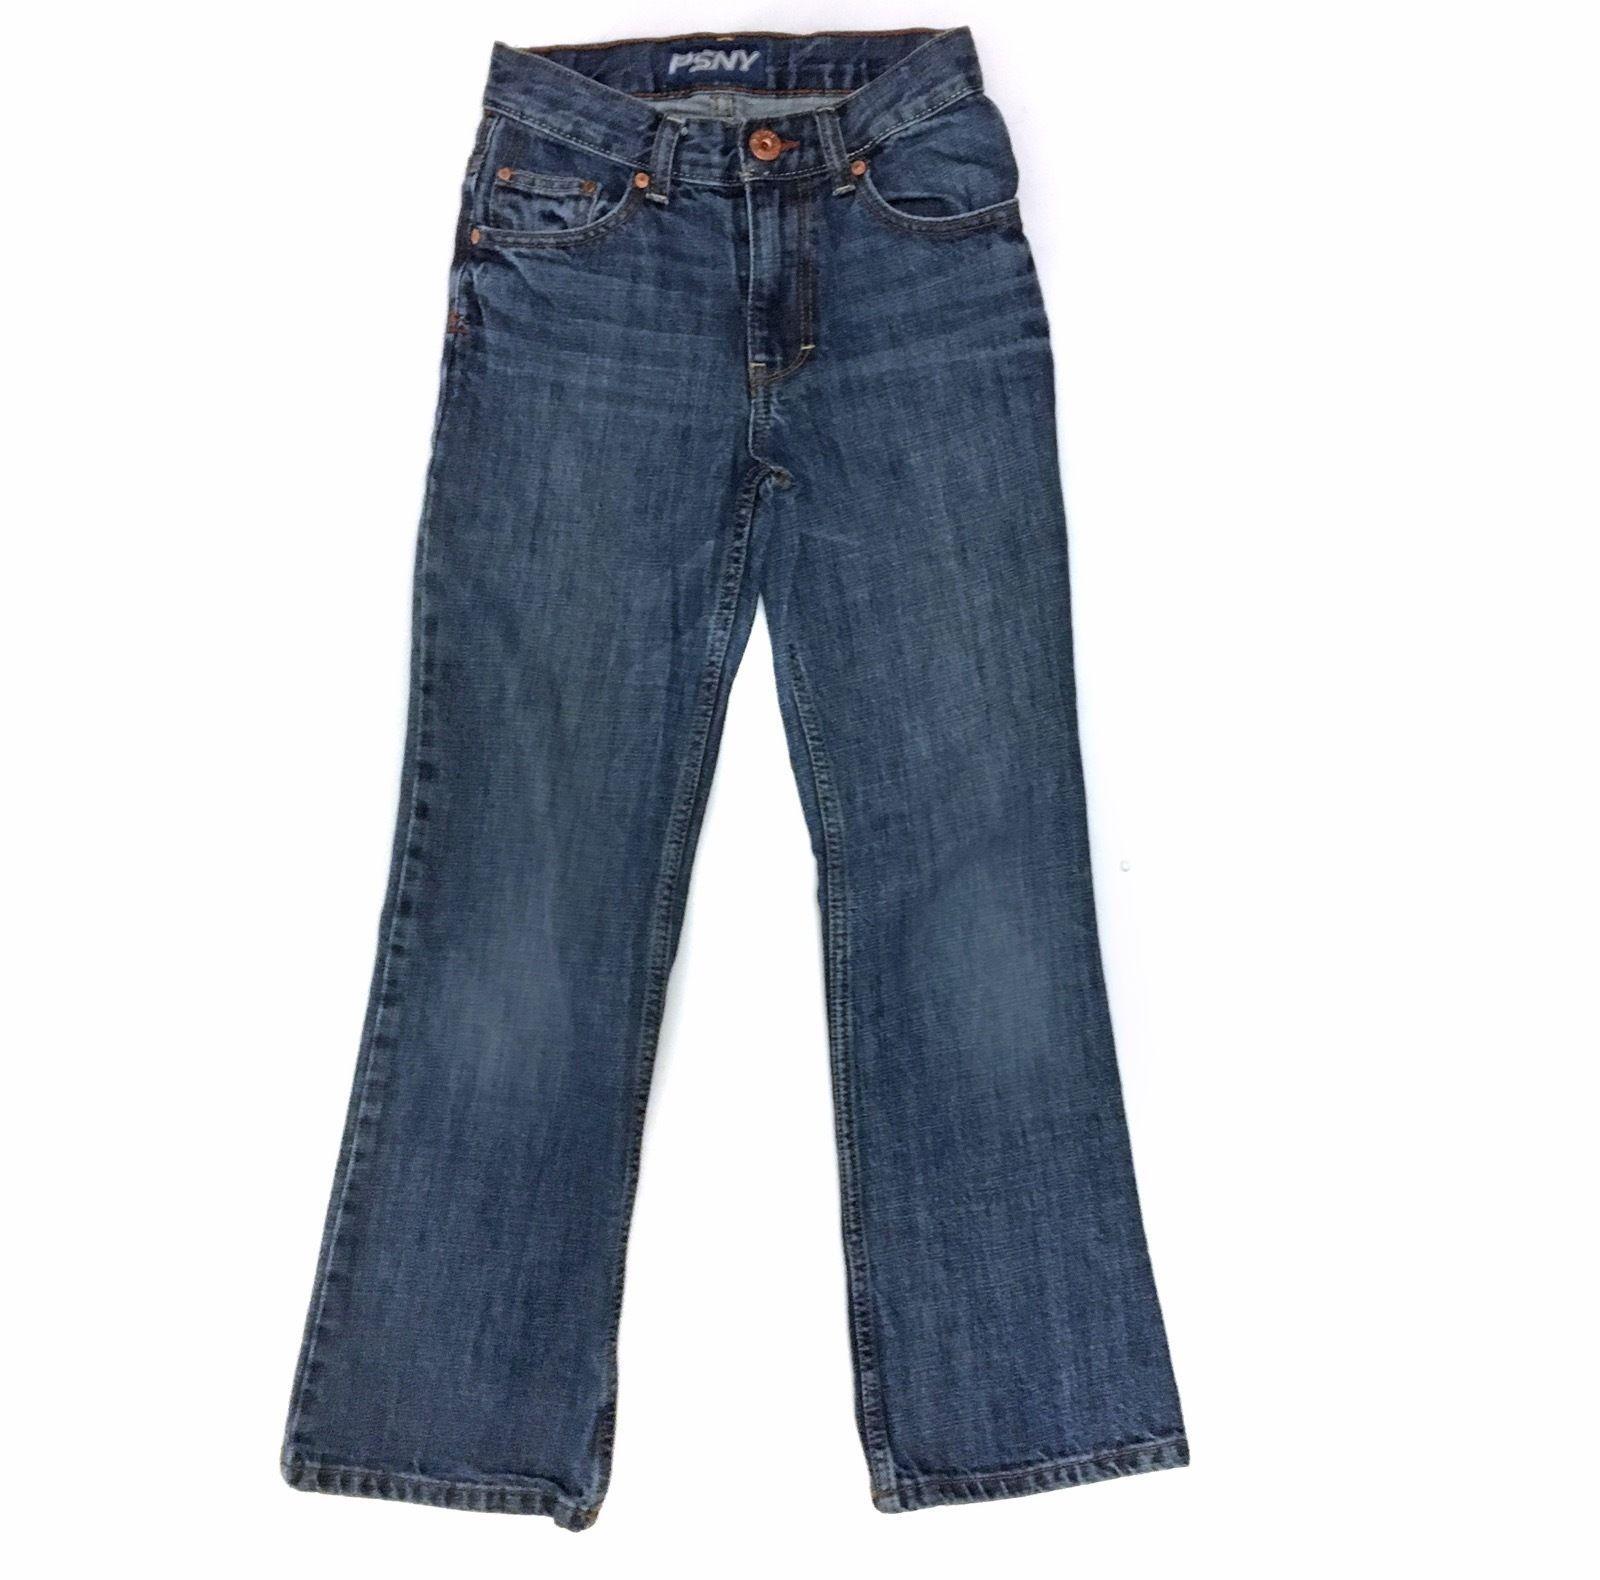 P.S Kids PSNY Aeropostale Jeans Pants Denim Bootcut 10s 10 S Slim